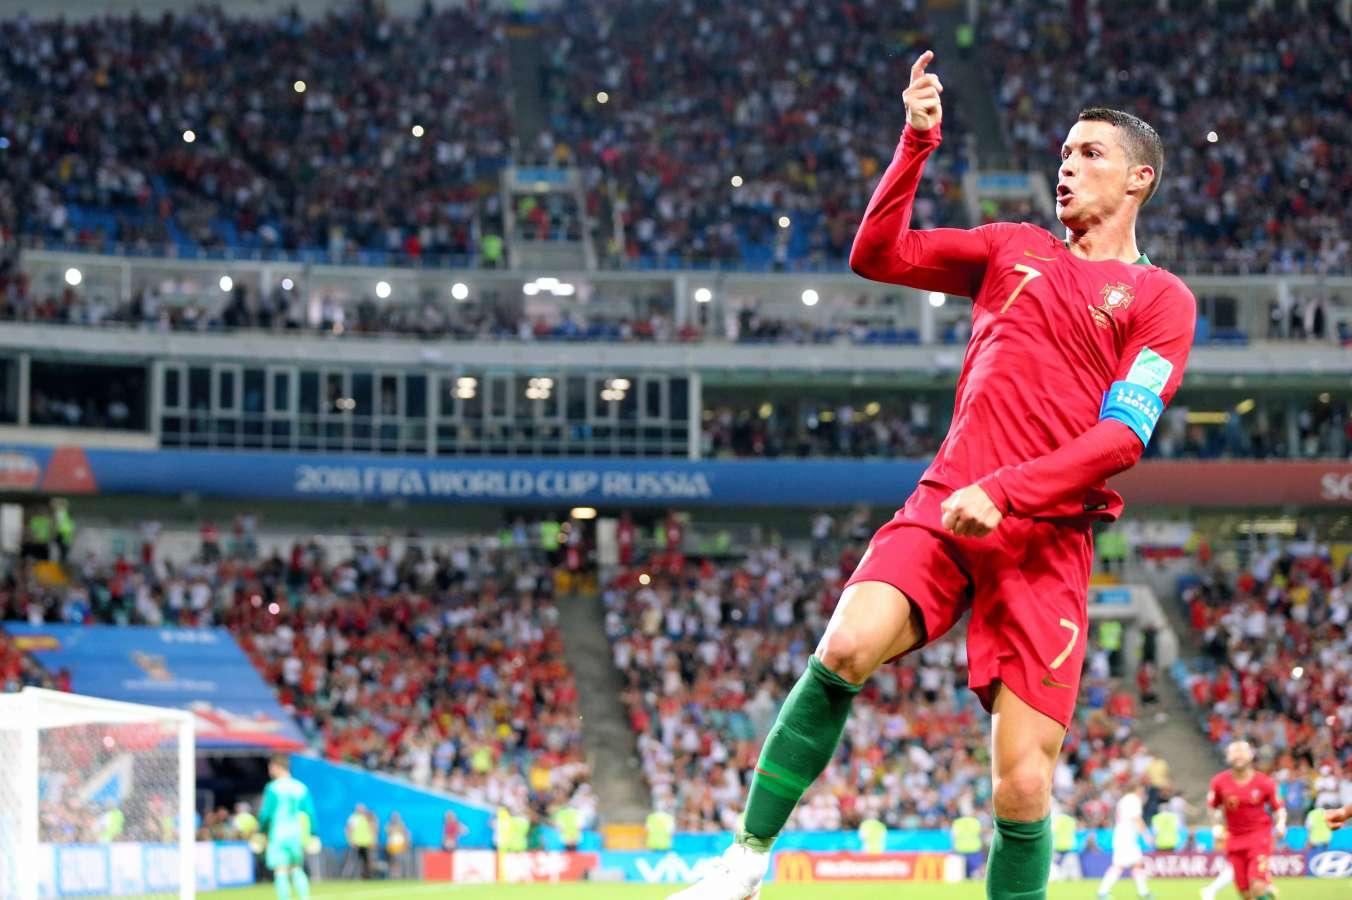 Spain vs uruguay betting preview goal over under betting nfl tips